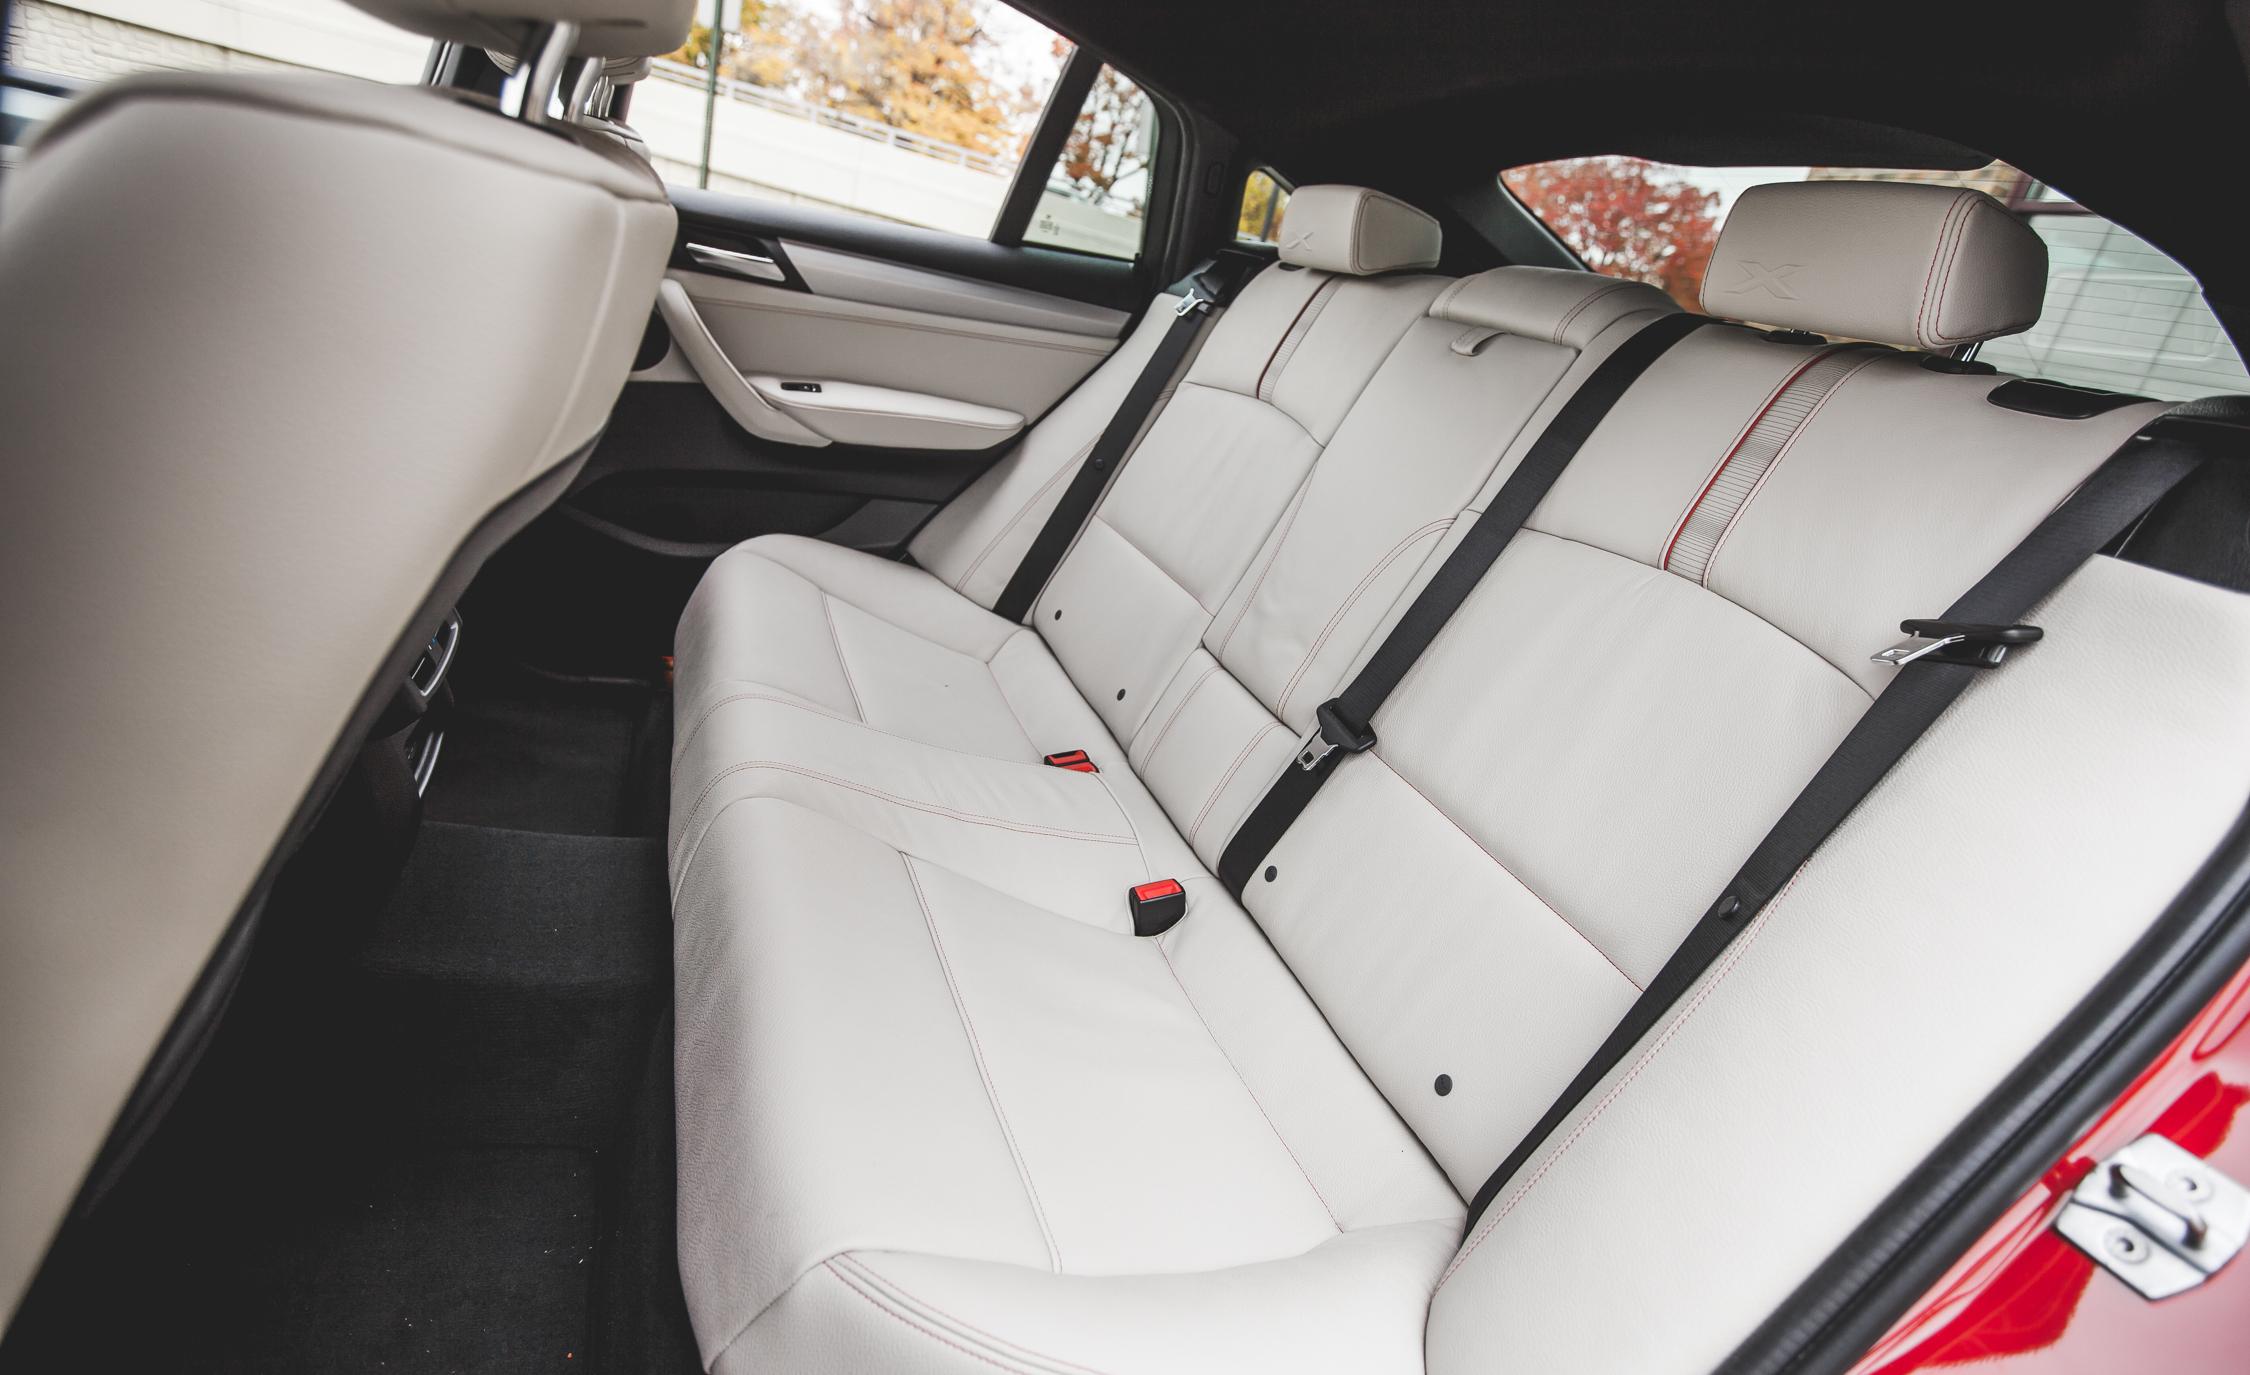 2015 BMW X4 XDrive28i Interior (Photo 11 of 29)